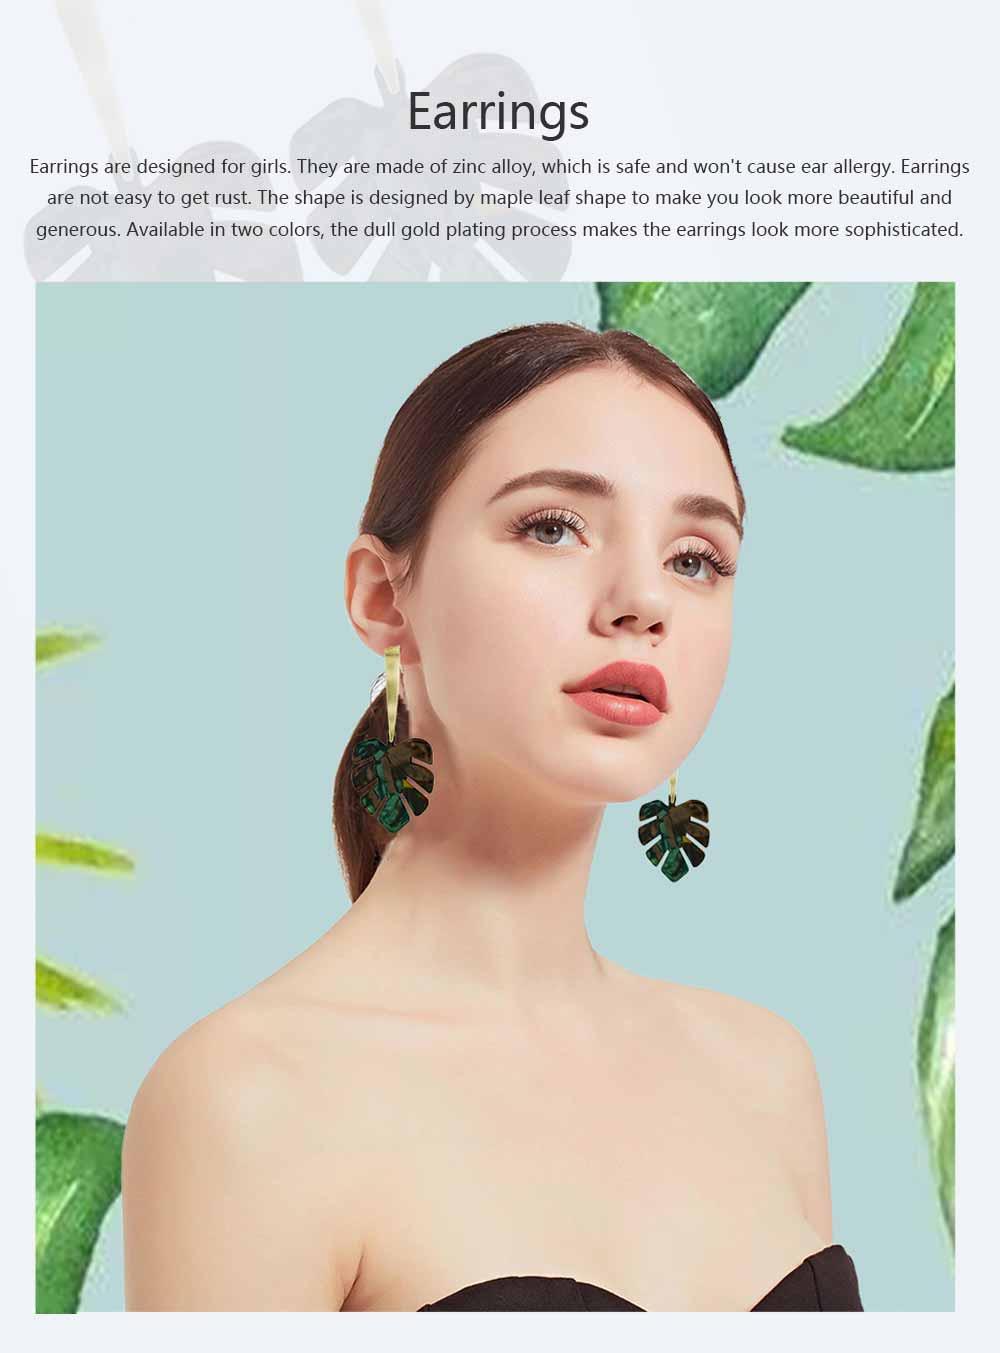 Ear-bob Zinc Alloy Material Ear Pendant Electroplating Process Maple Leaf Earring Decoration  Fashionable Earrings 0